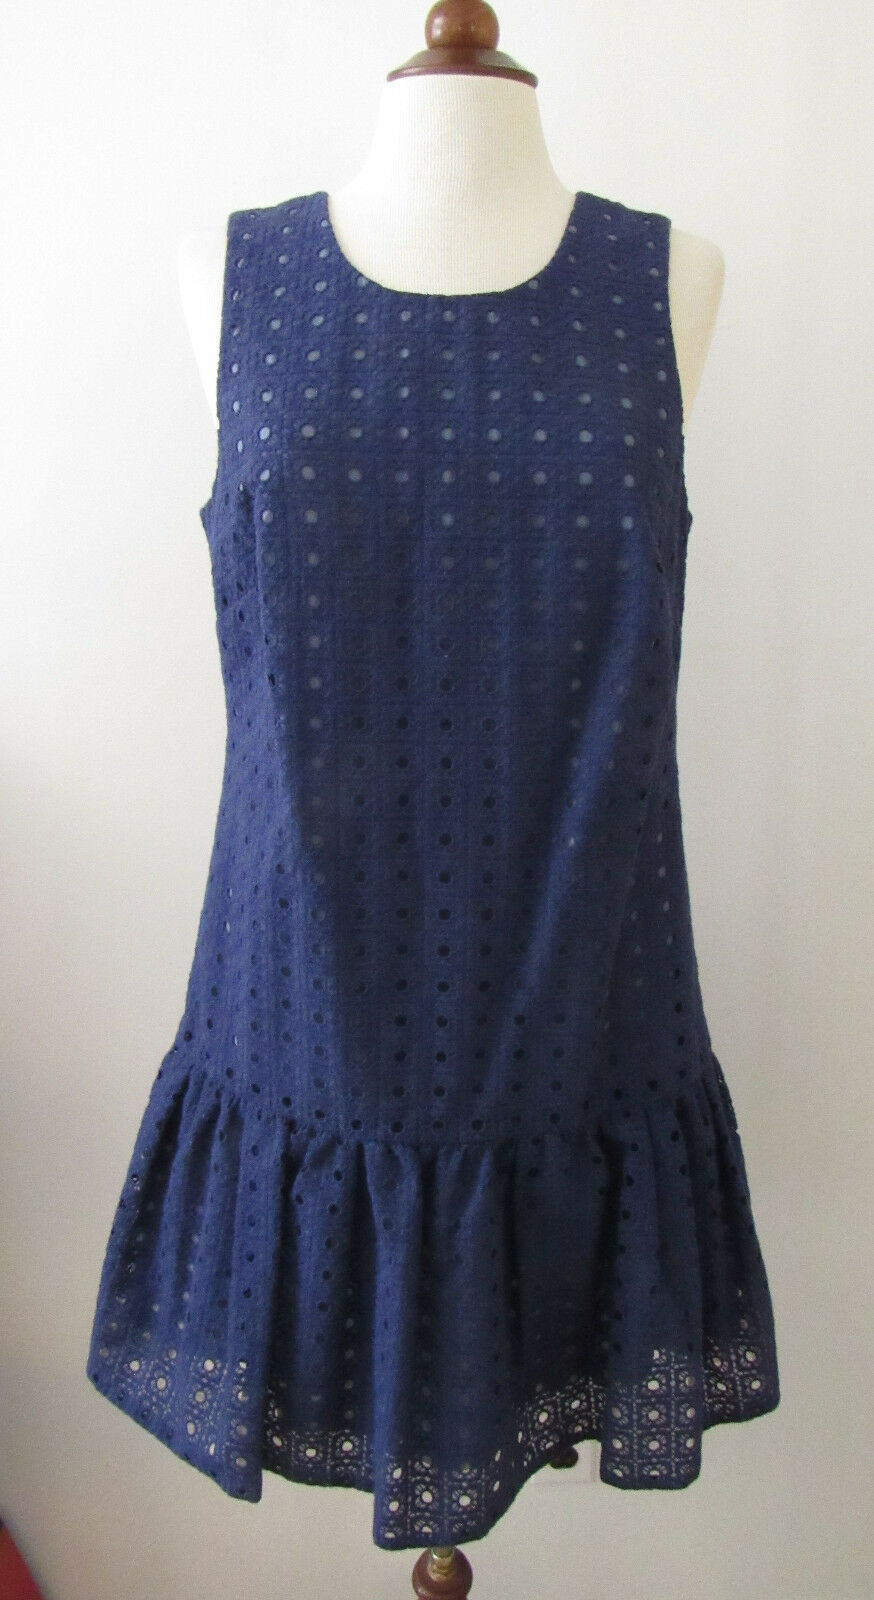 NWT Womens J. CREW bluee Organza Eyelet Anna Dress  Size 10